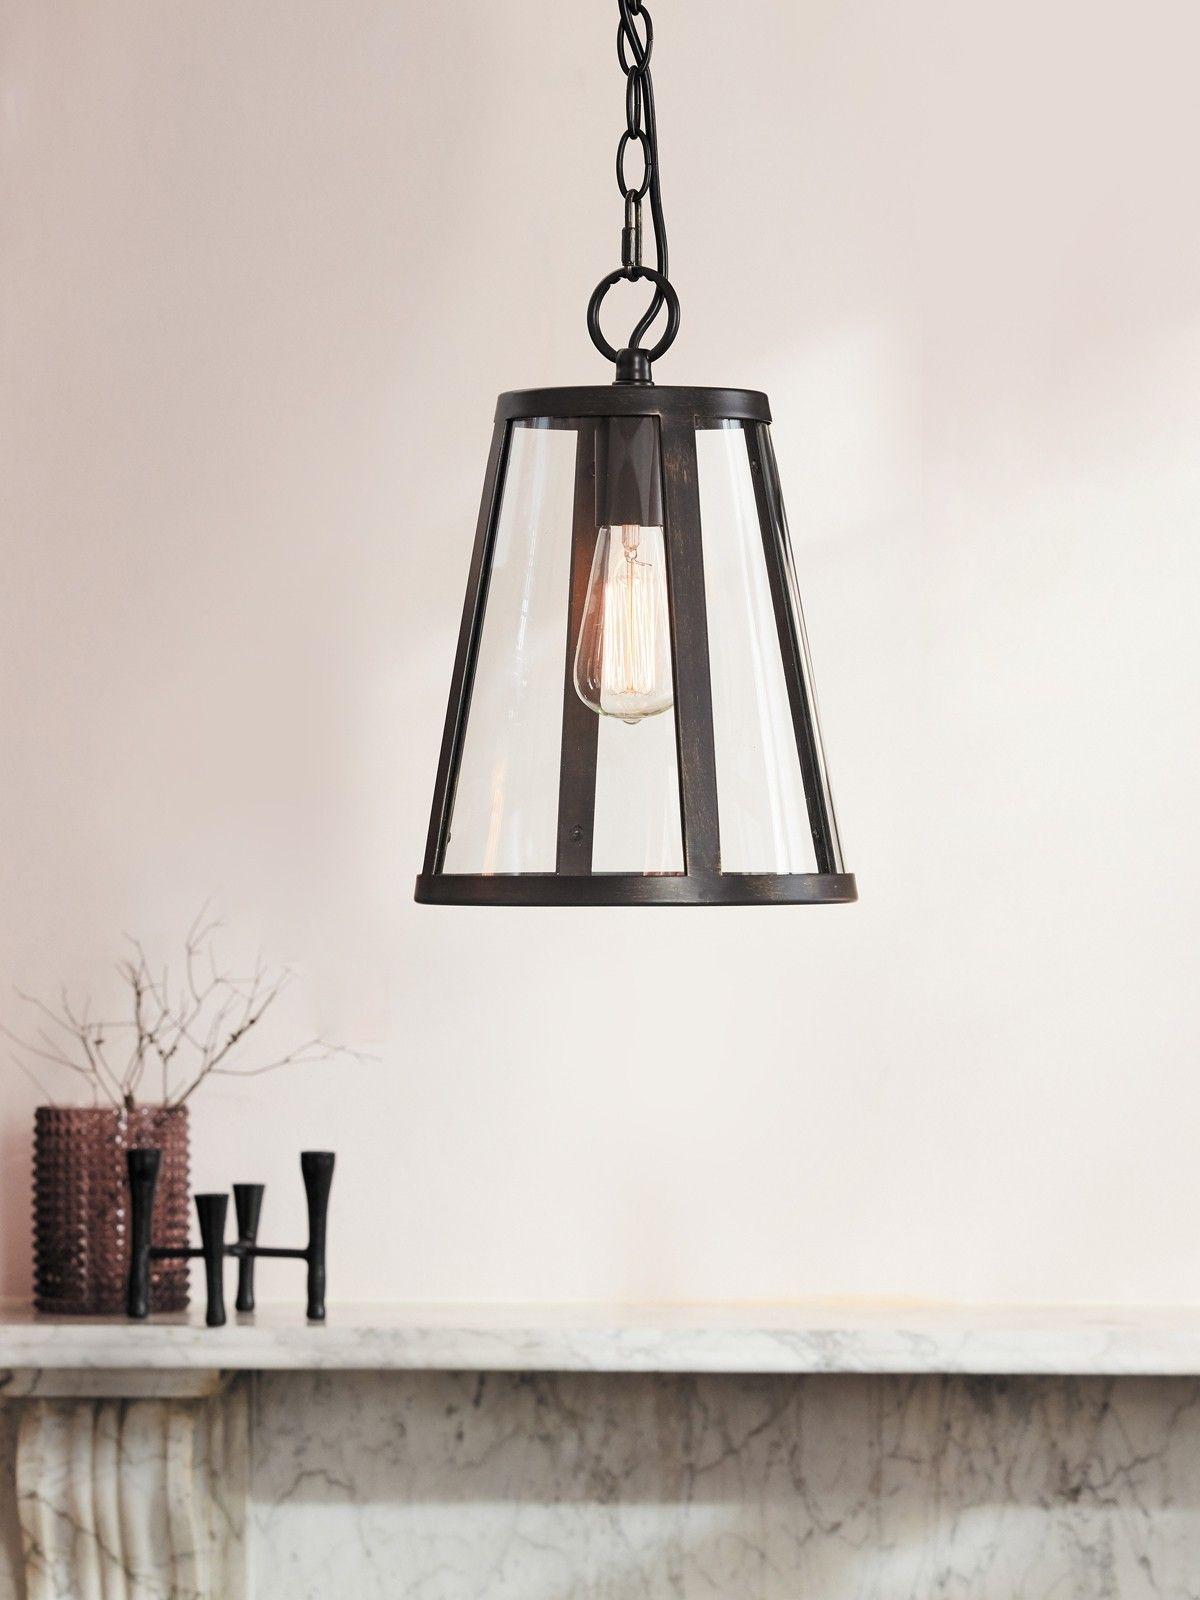 Westhampton 1 Light Pendant in Antique Black Pendant